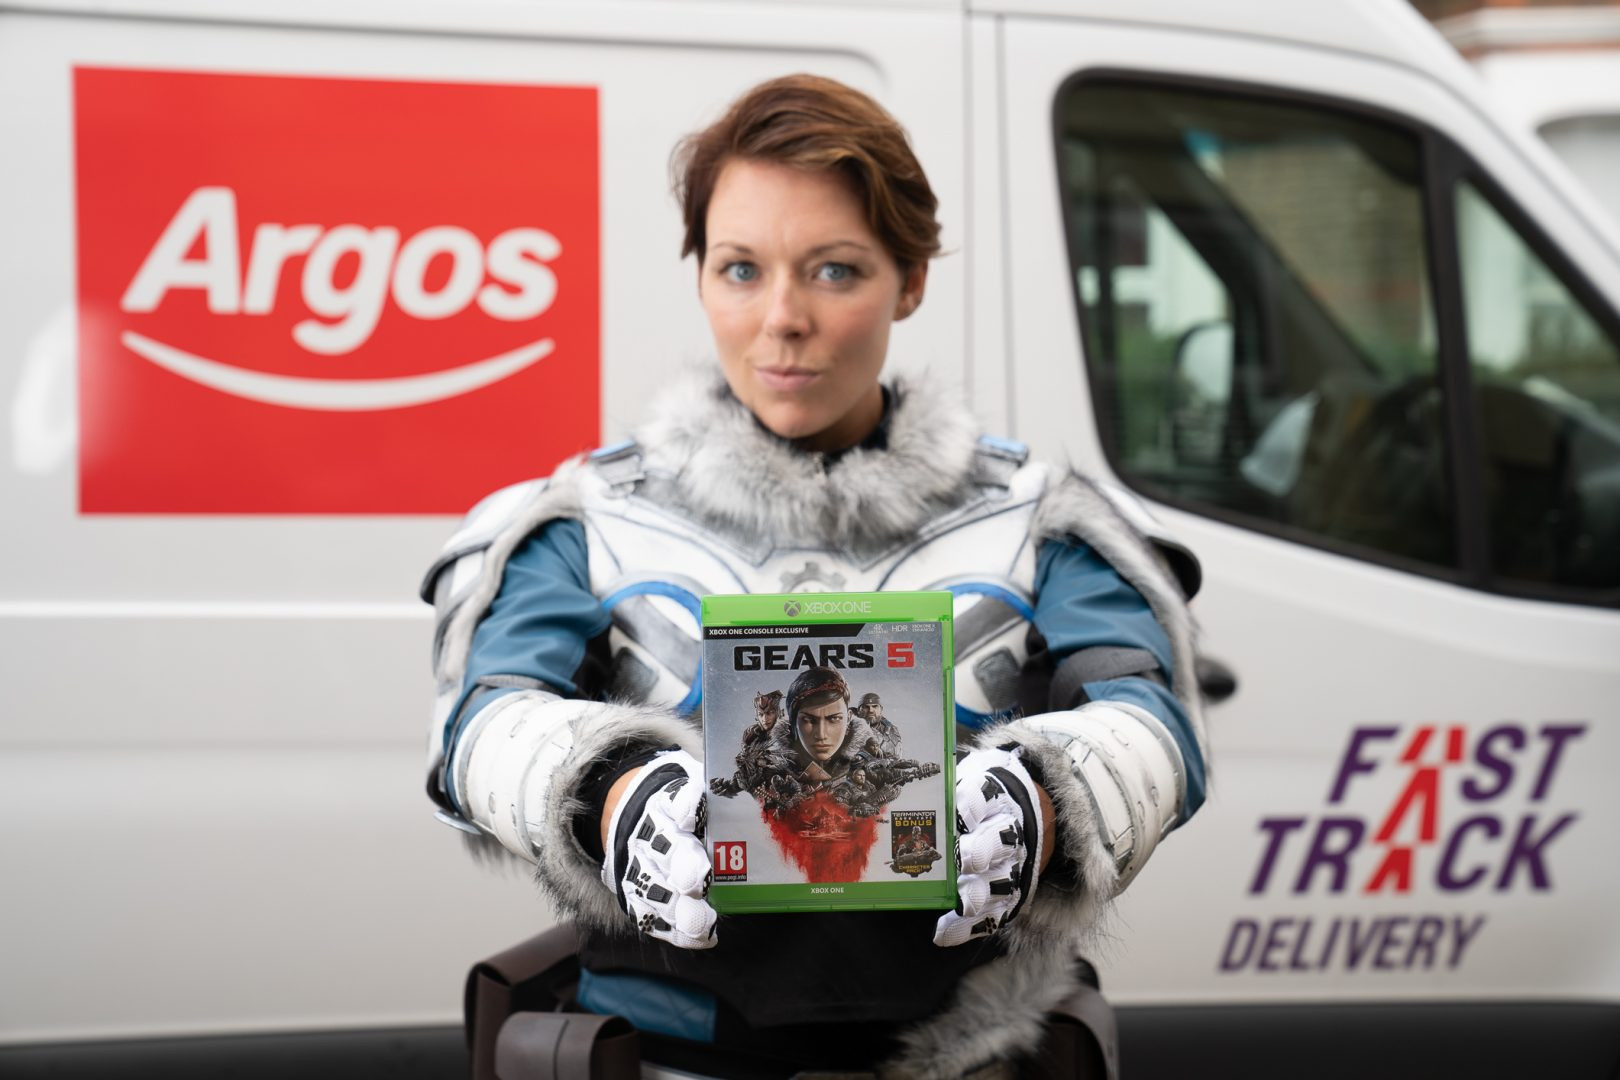 Gears 5 - Kait Diaz - Argos Campaign